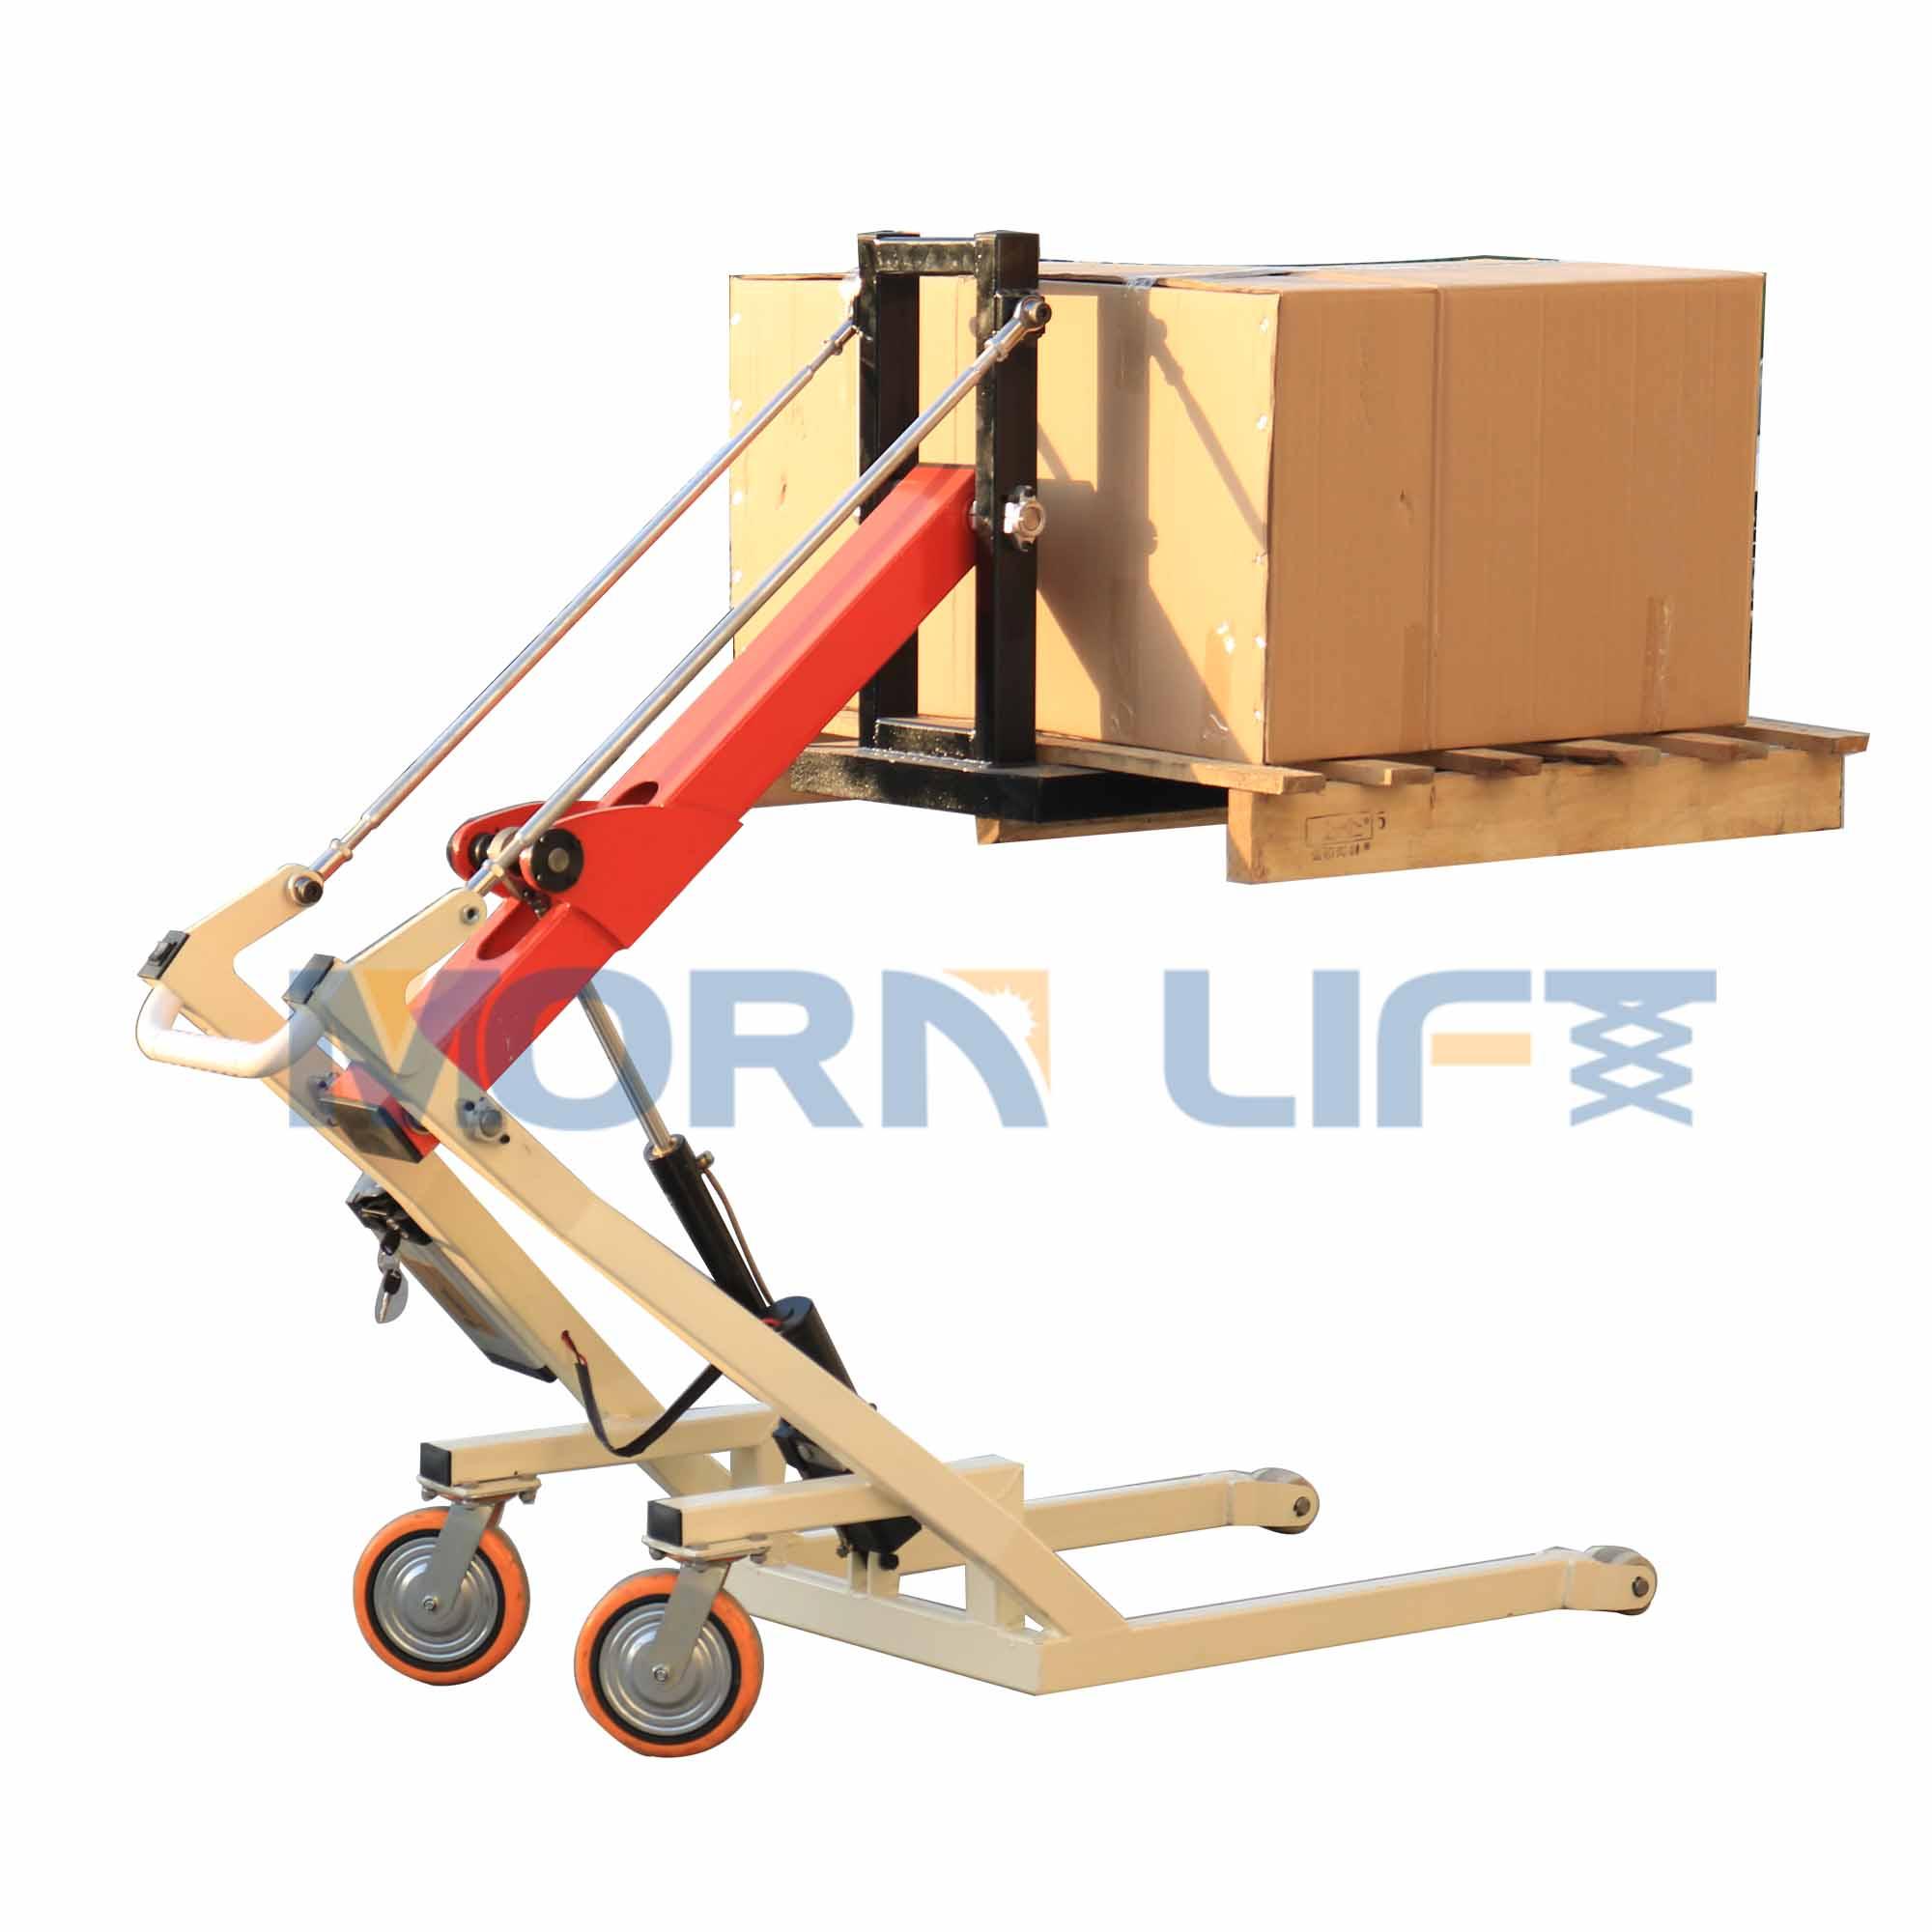 MORN LIFT Semi-electric Pallet Truck